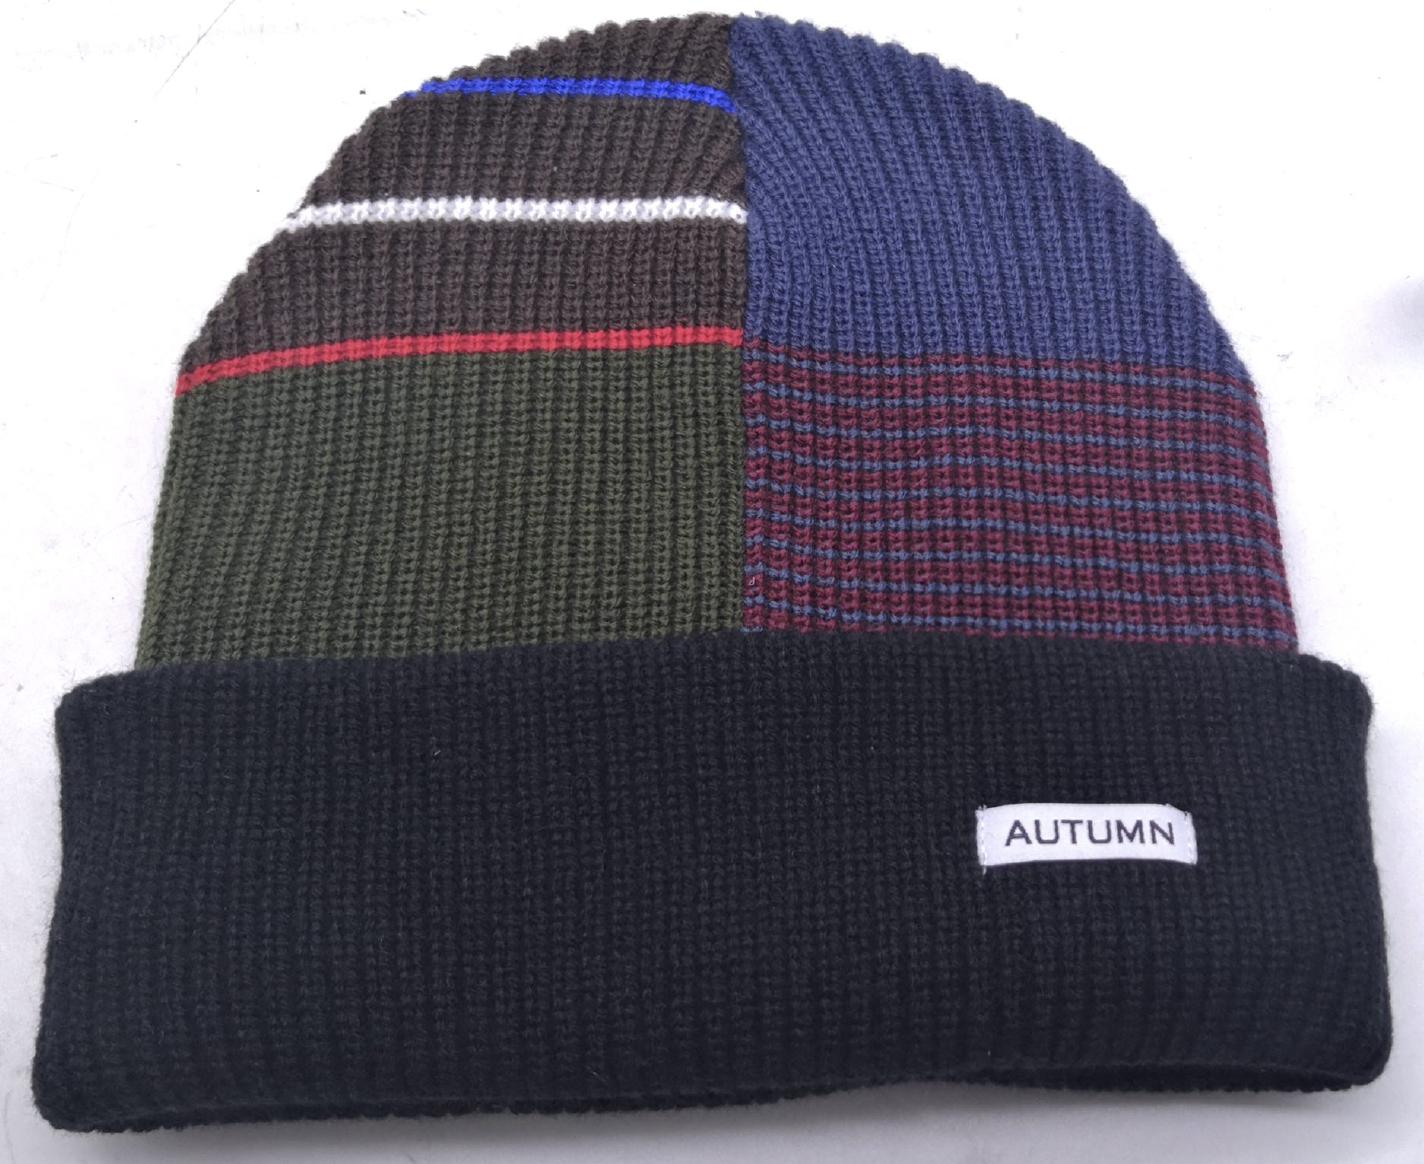 Autumn Patchwork Select Beanie (Multiple Color Options)